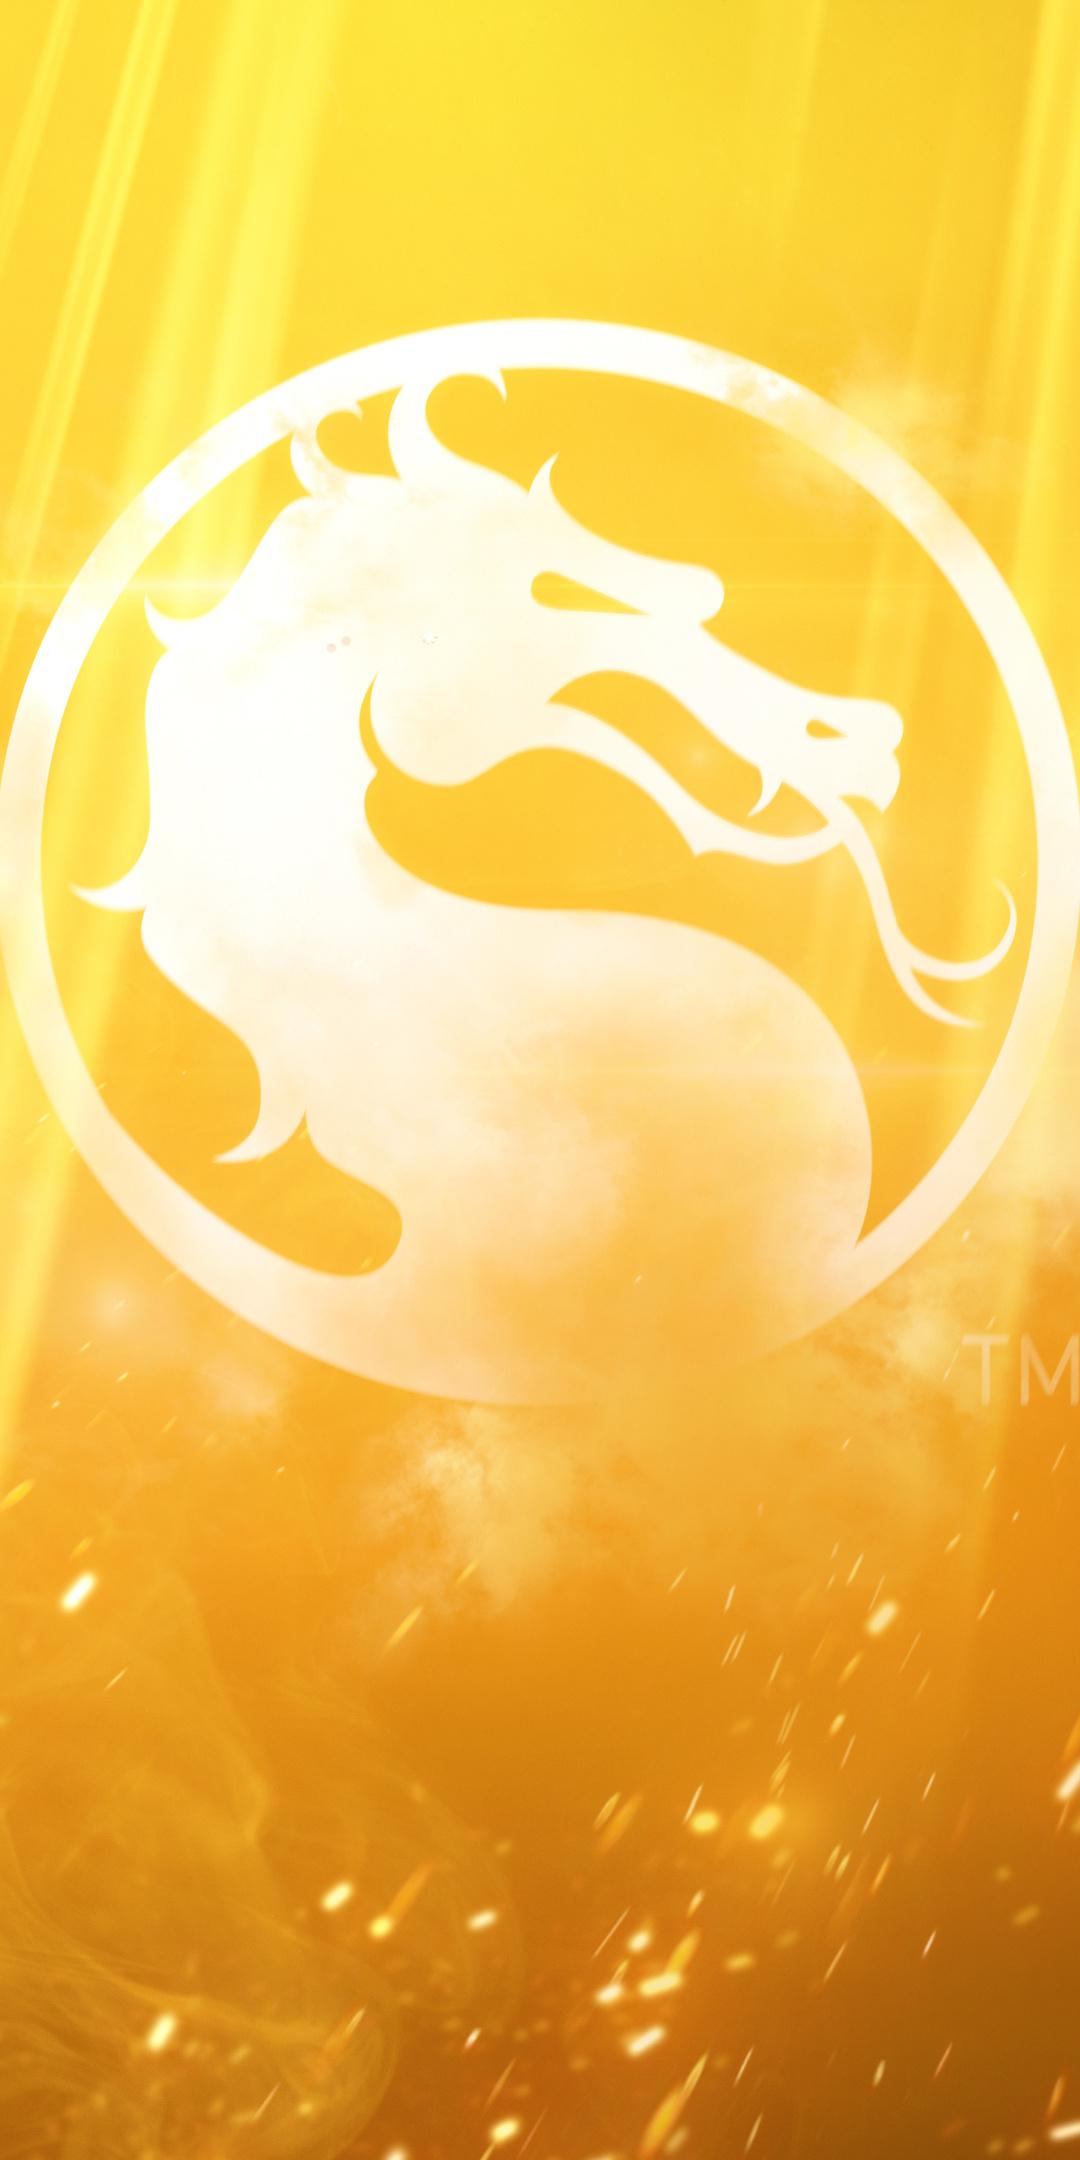 mortal-kombat-11-logo-xk.jpg